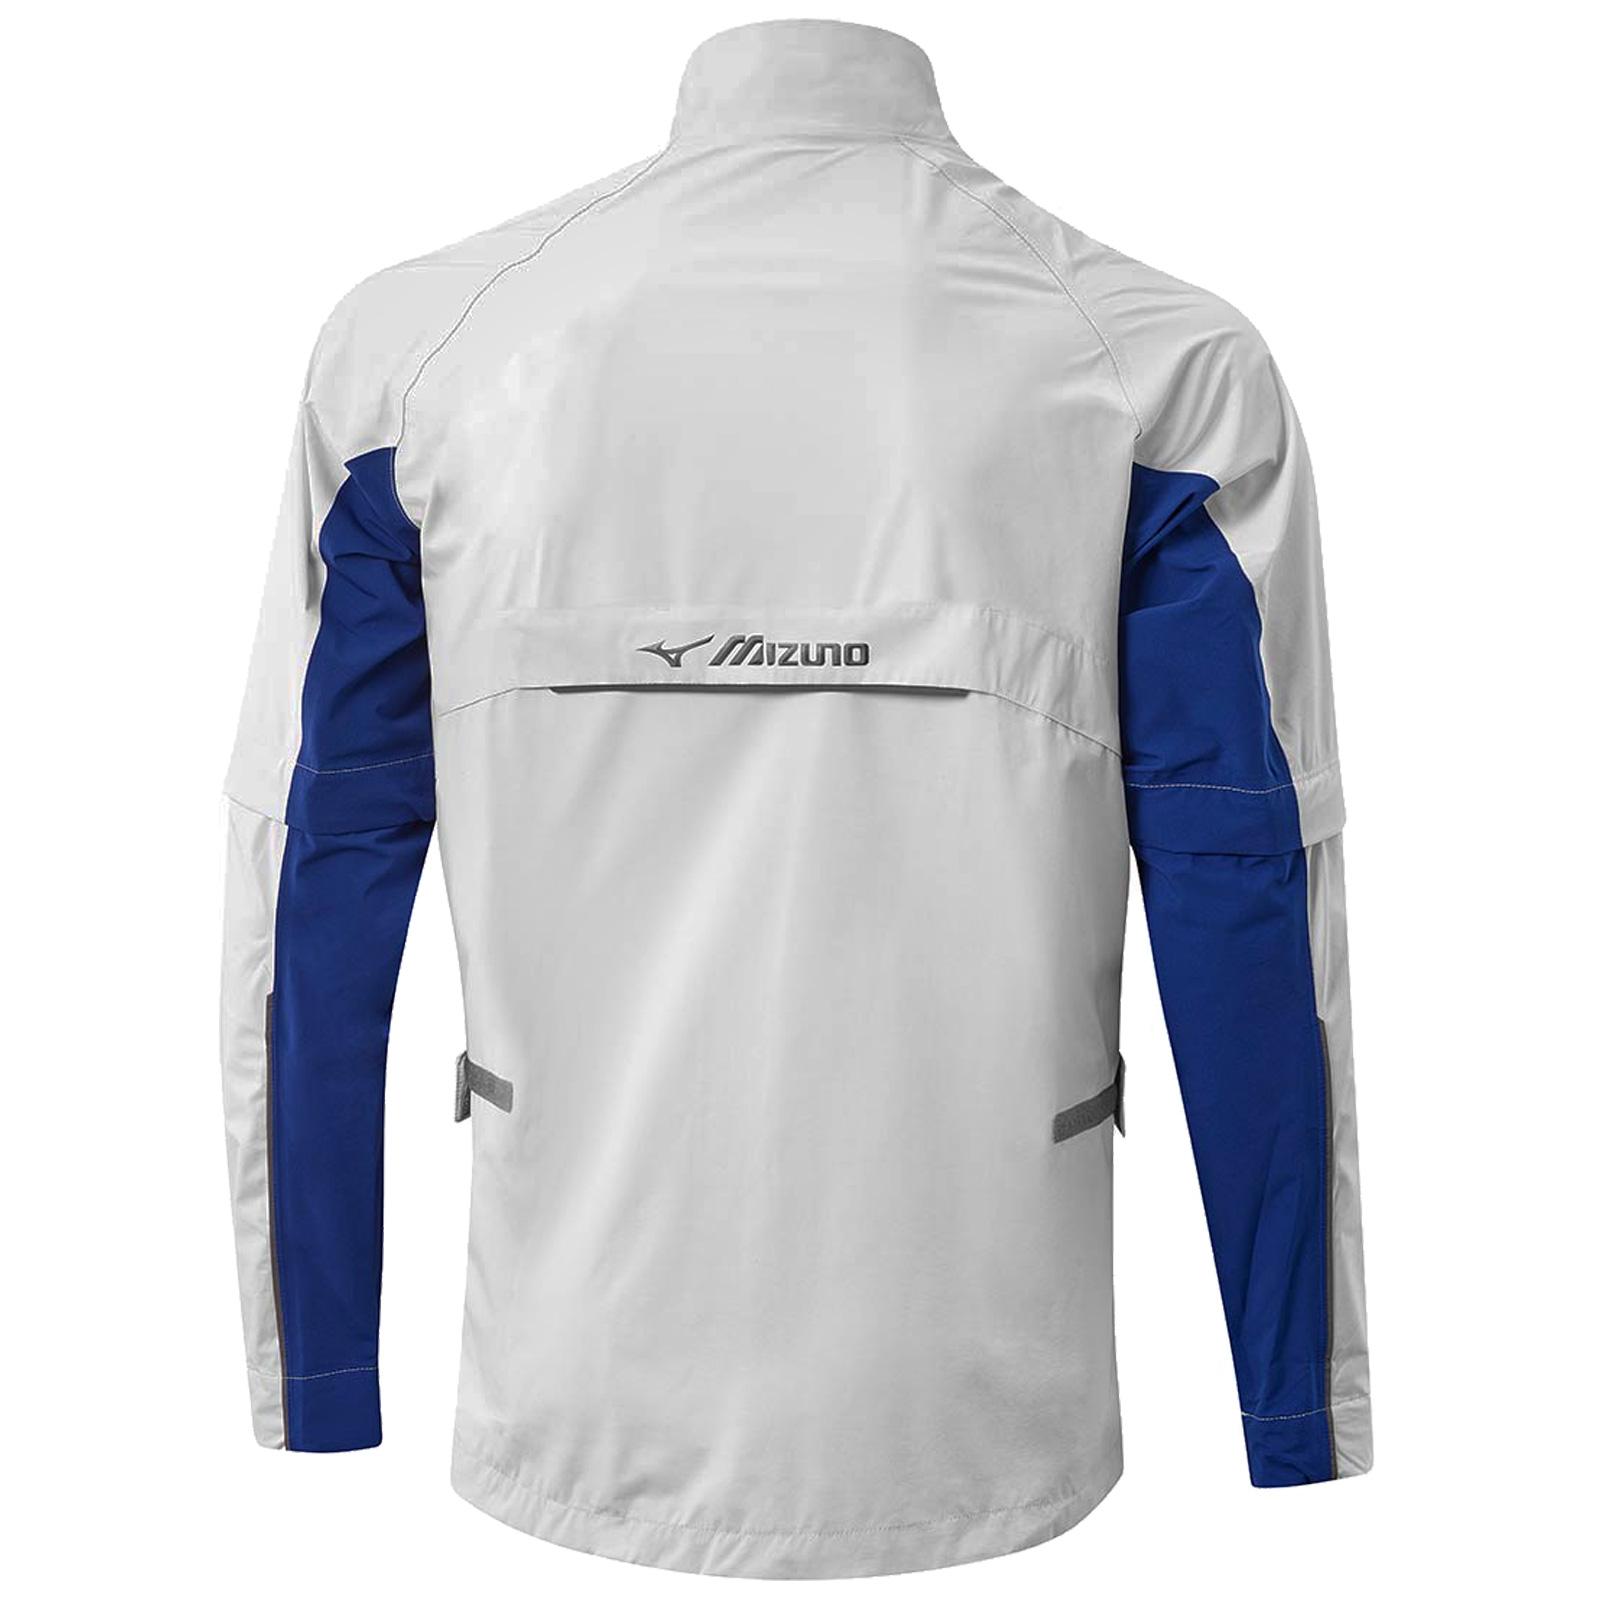 Mizuno-Mens-Impermalite-F20-Waterproof-Rain-Jacket-Top-Lightweight-Coat-Golf thumbnail 7